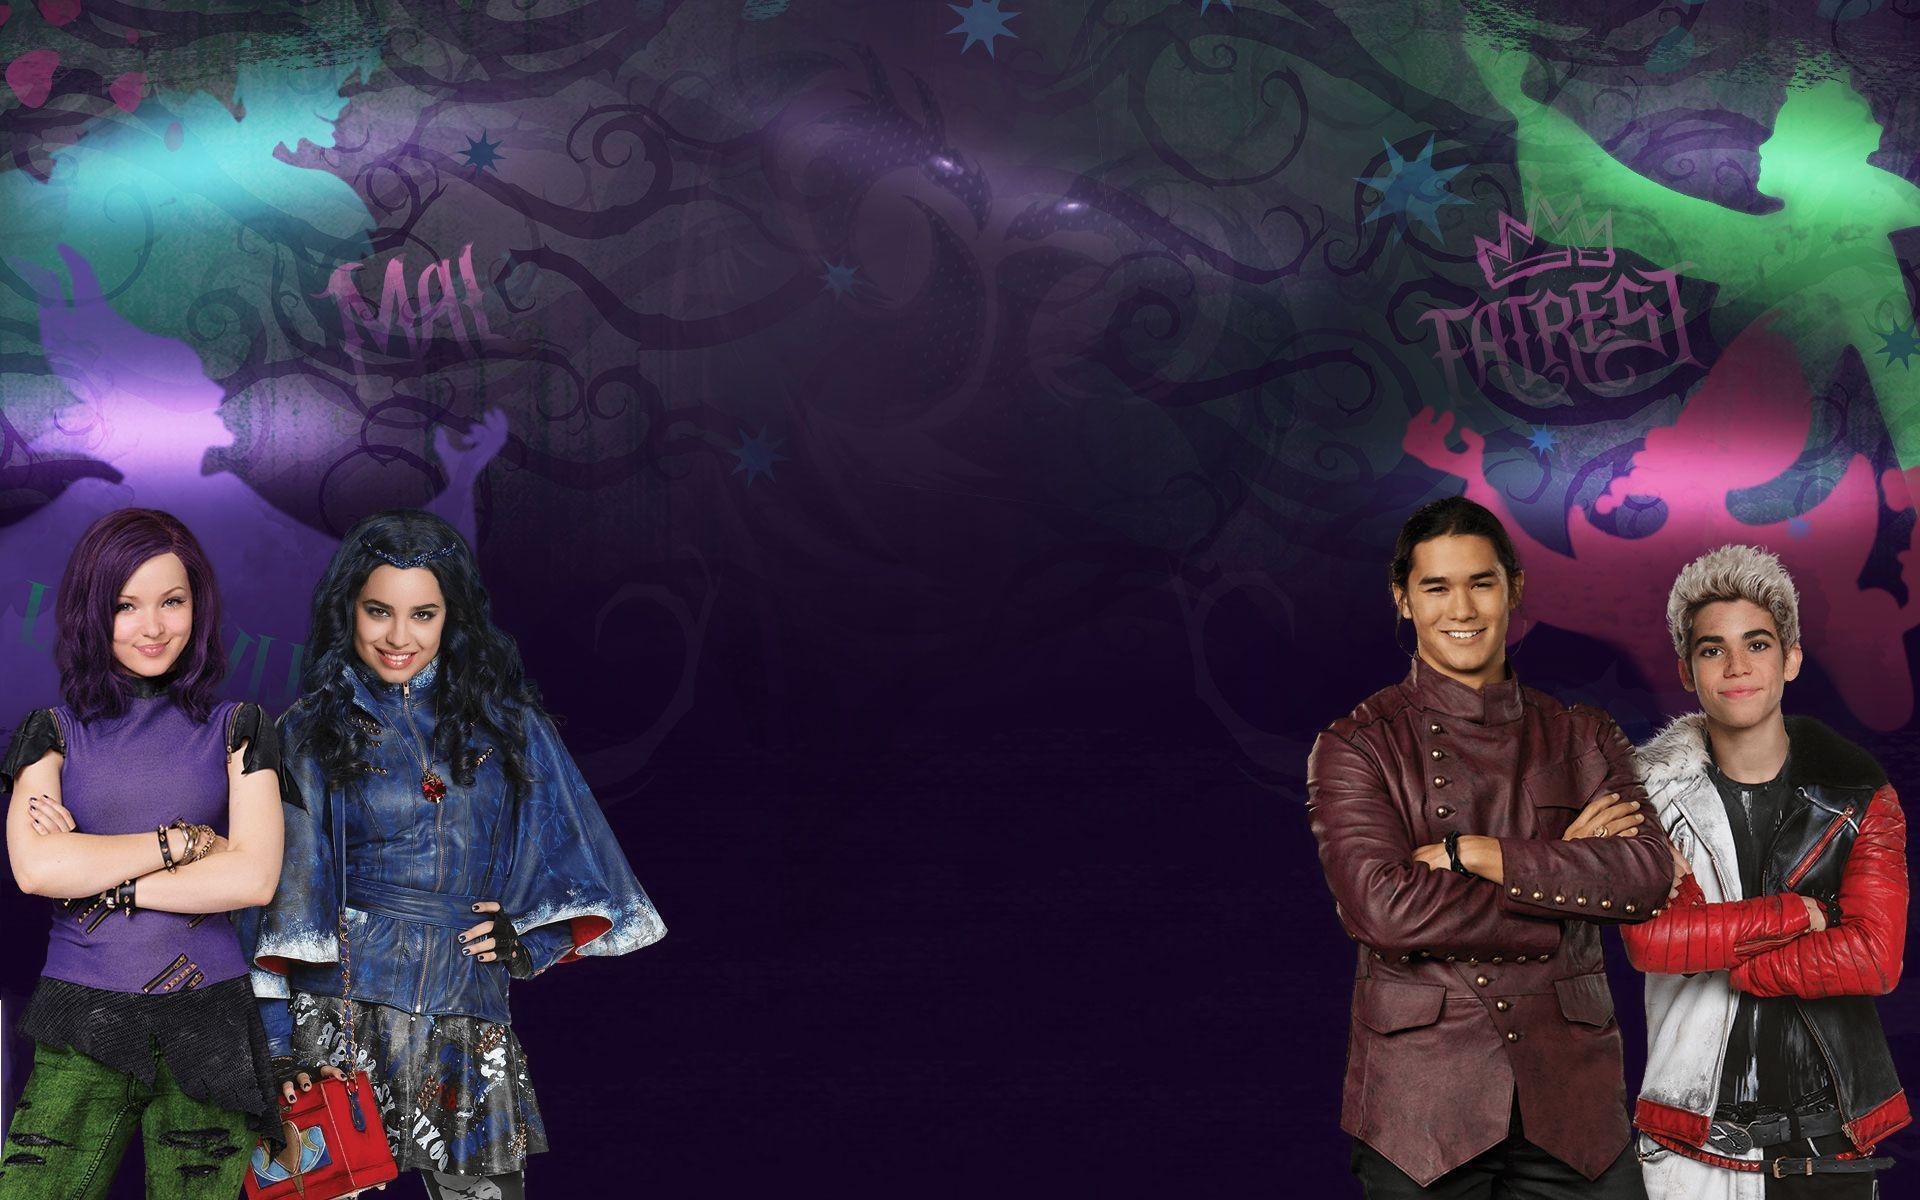 Disney Descendants Wallpaper - WallpaperSafari | dependents party ...